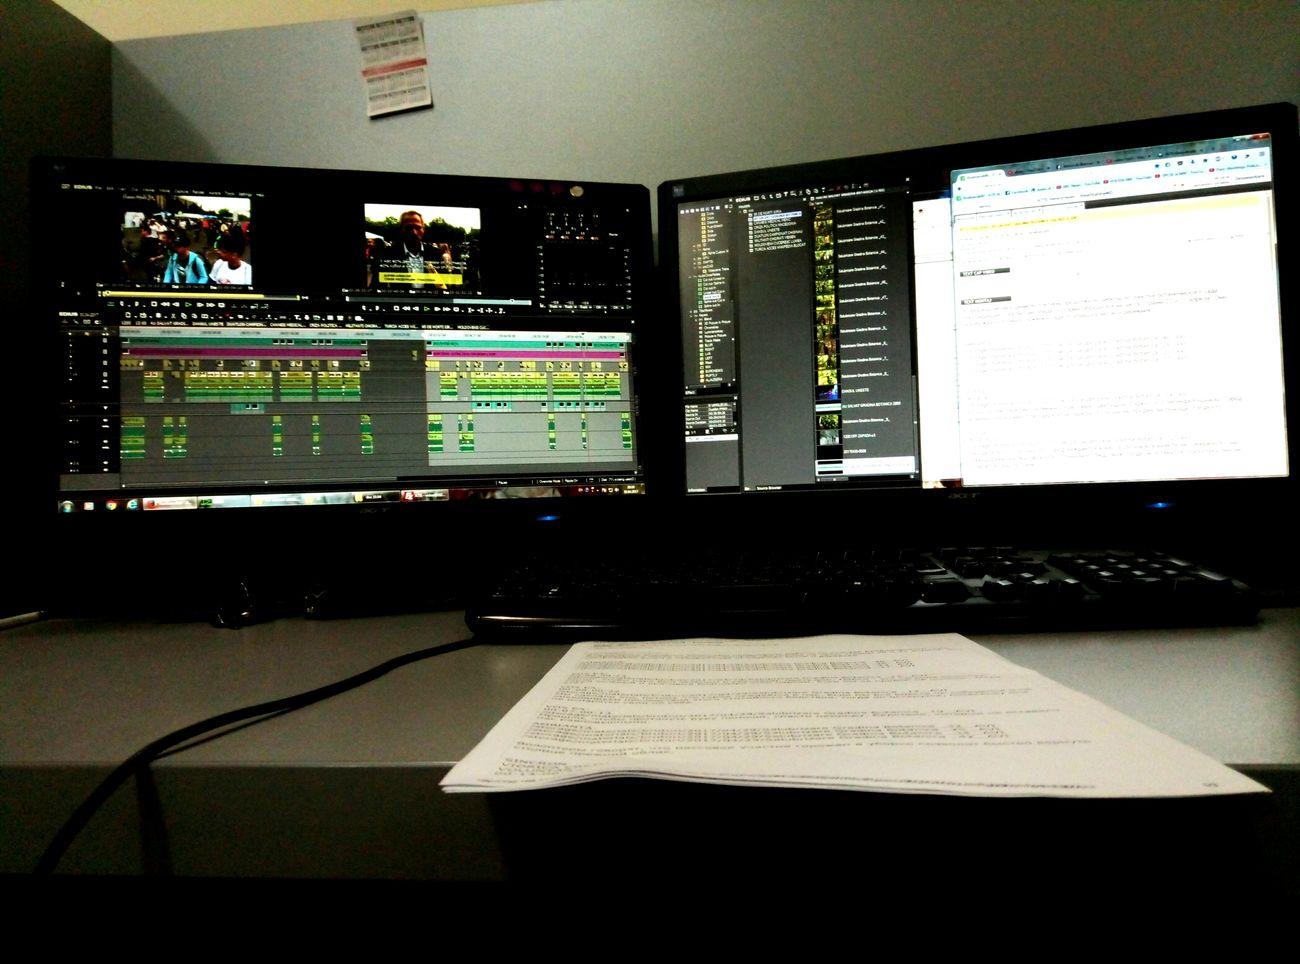 Working Realitatea TV News On TV